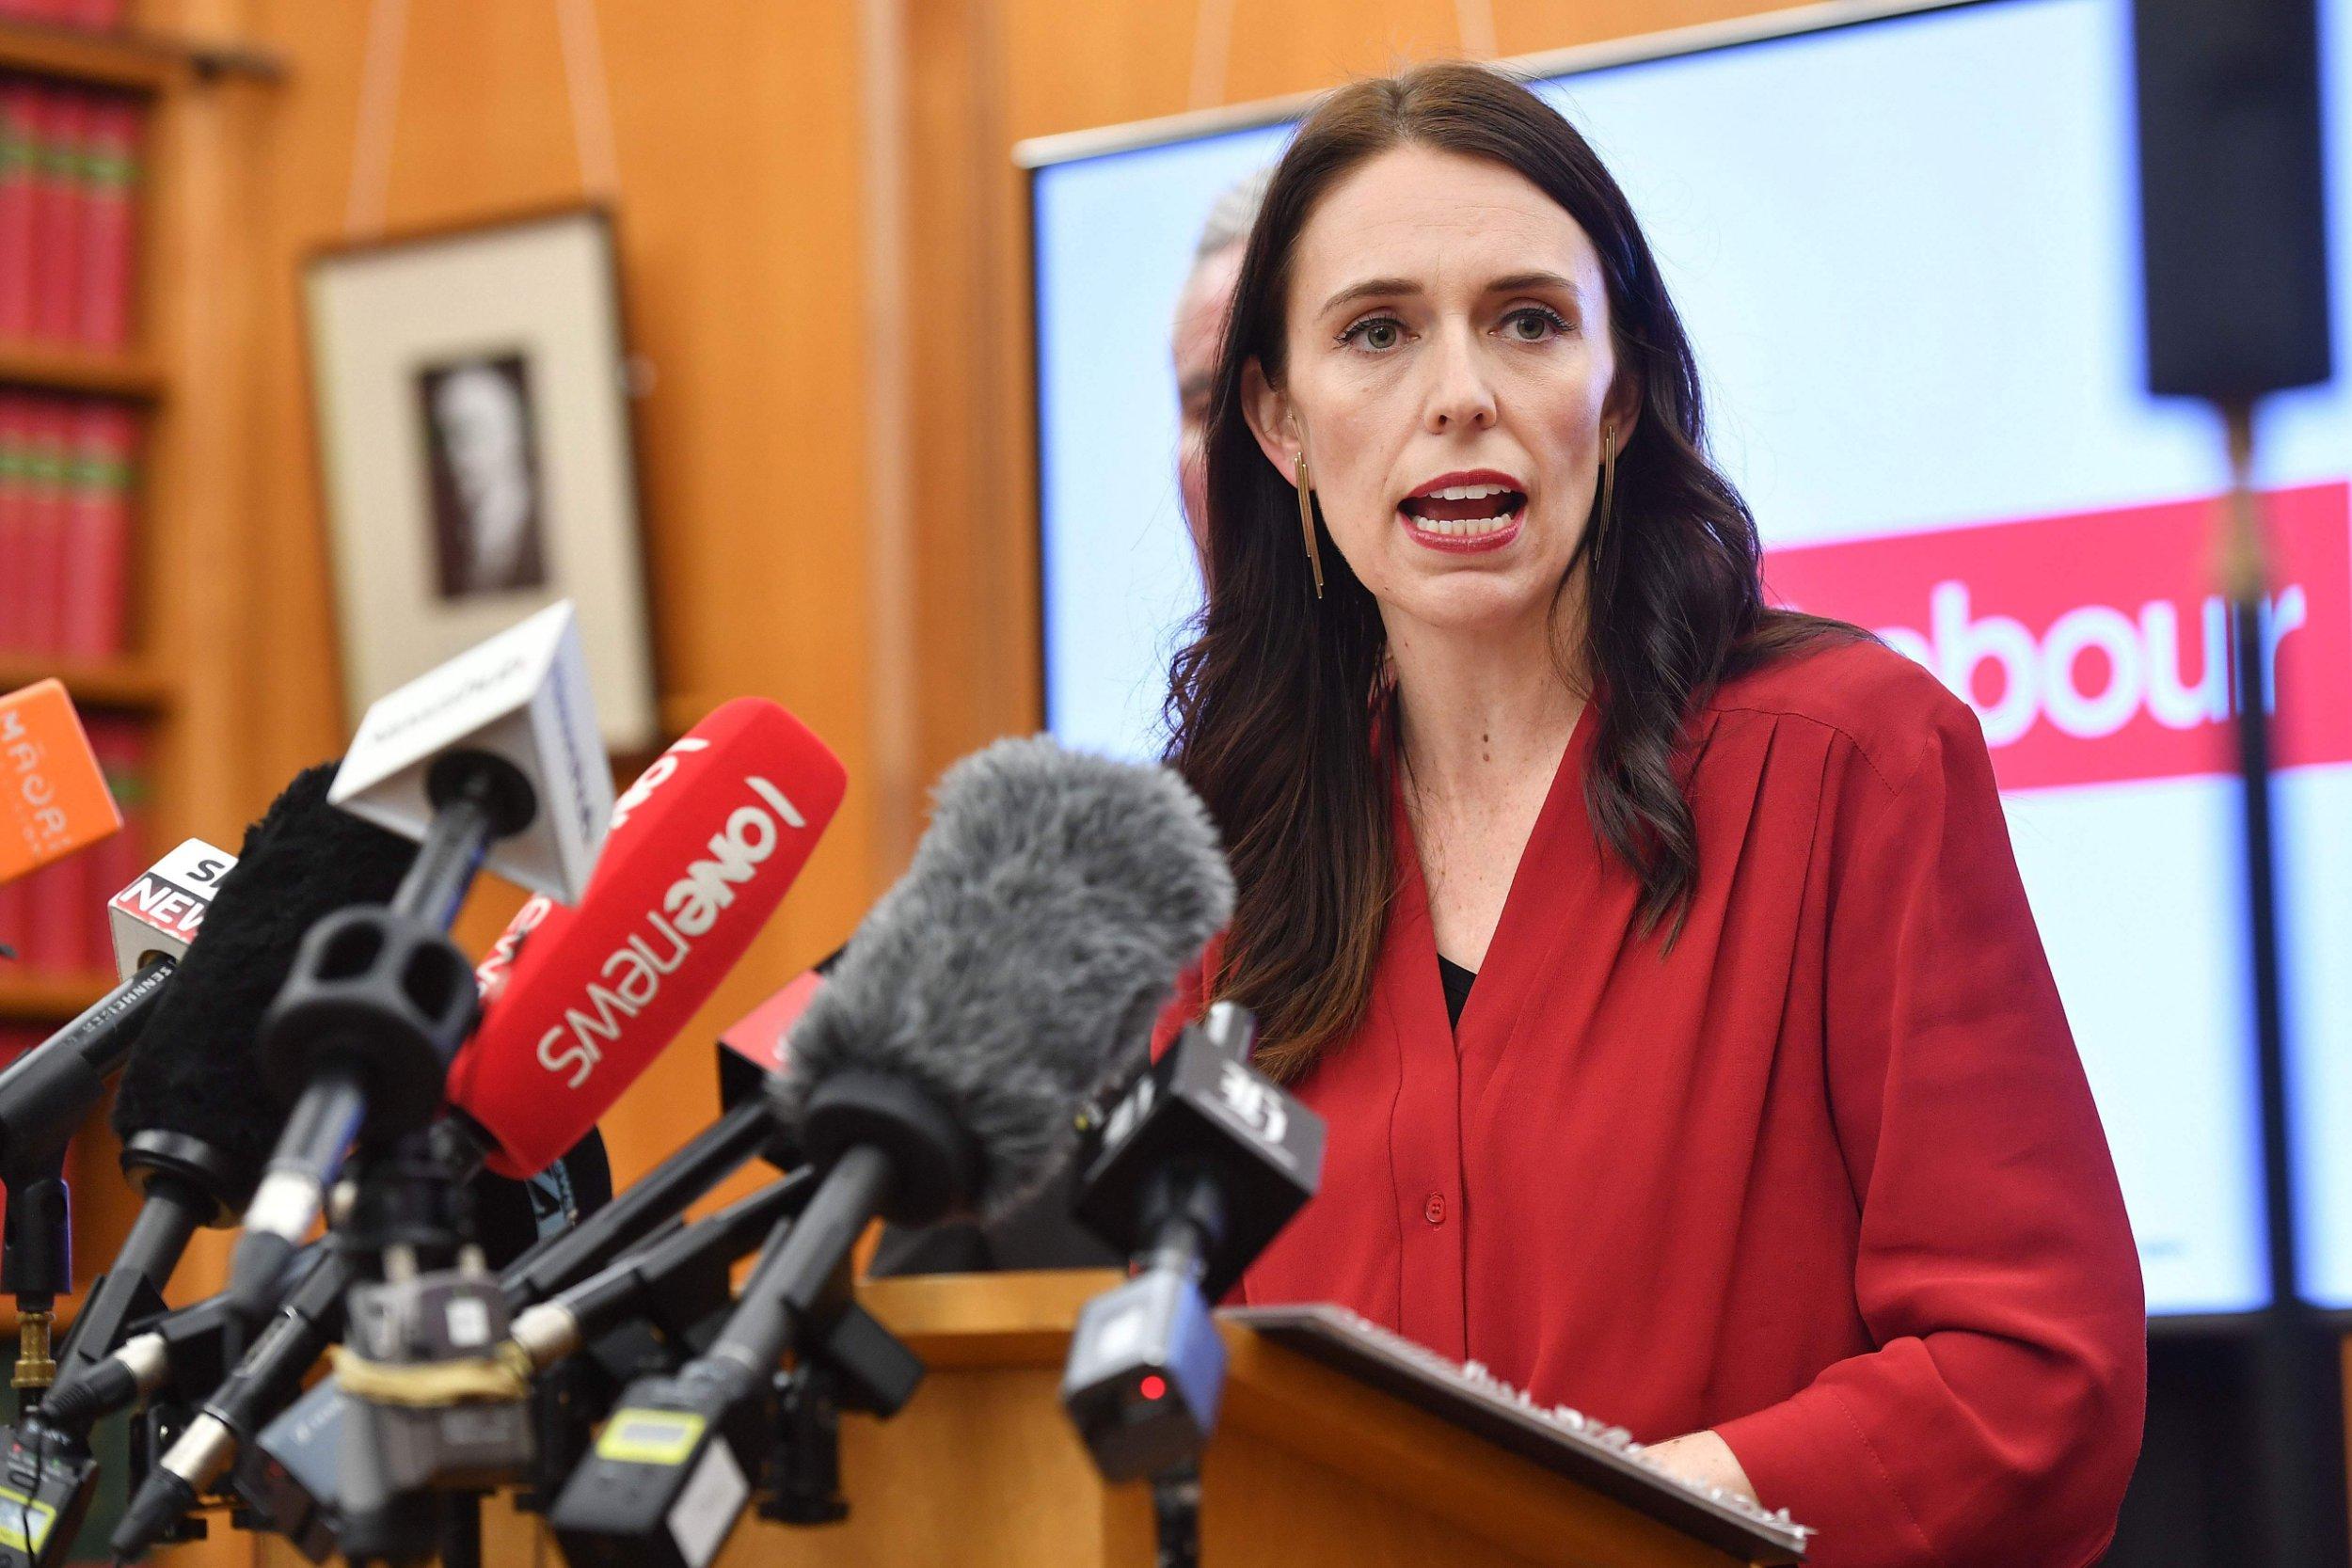 We should all be glad New Zealand prime minister Jacinda Ardern is pregnant